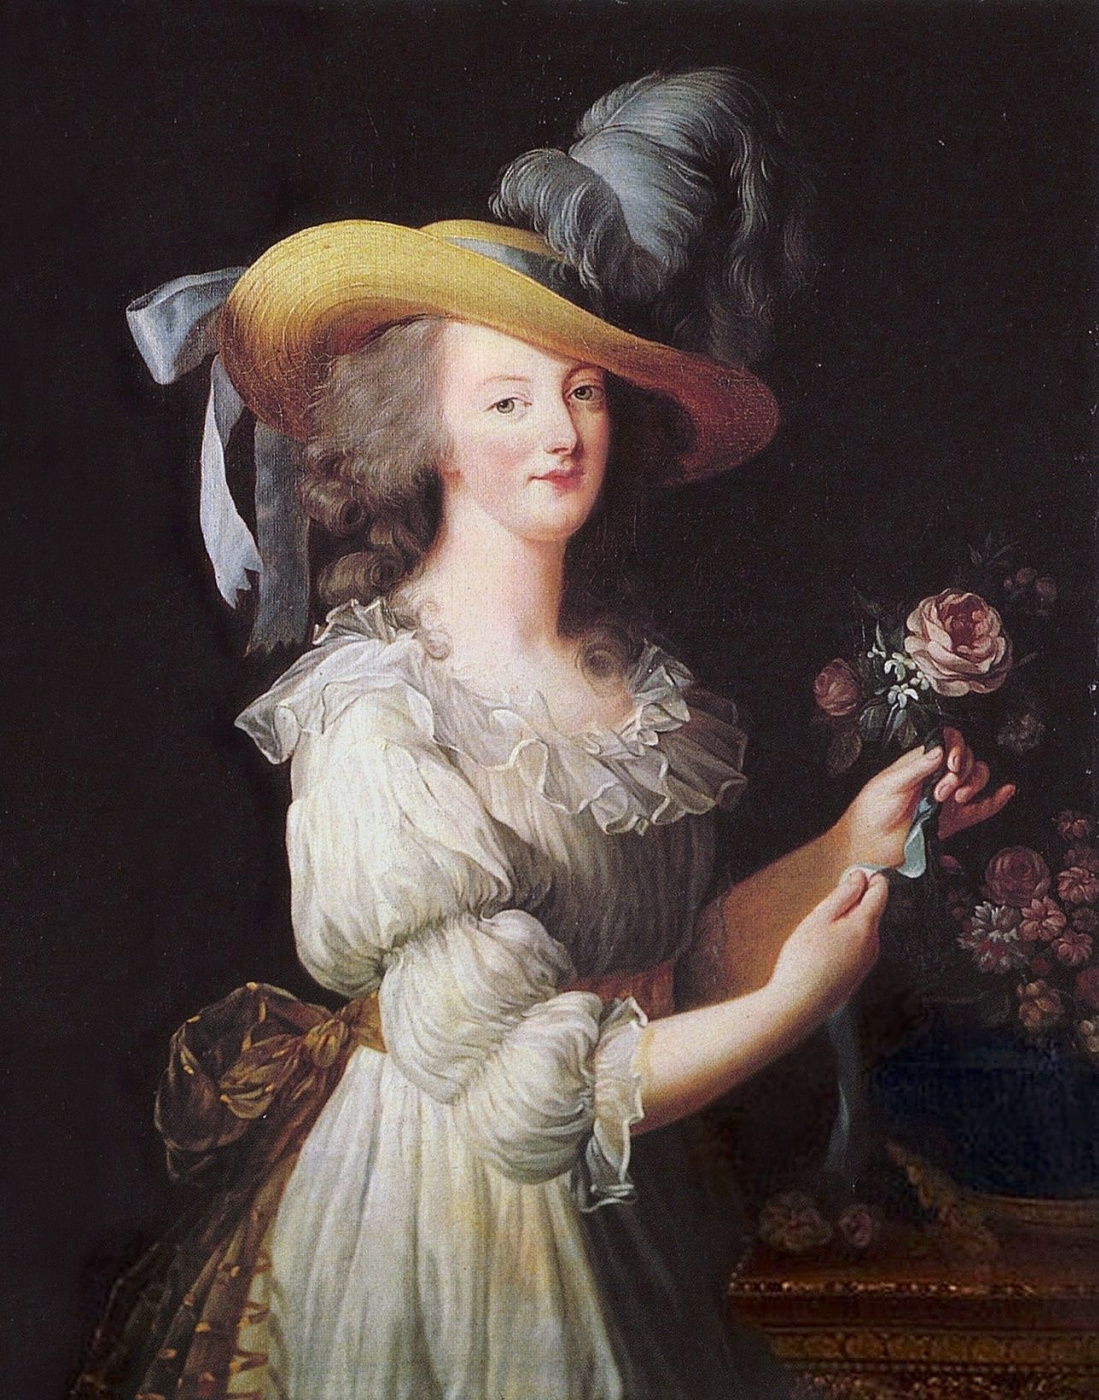 Э. Виже-Лебрен. Портрет Марии-Антуанетты